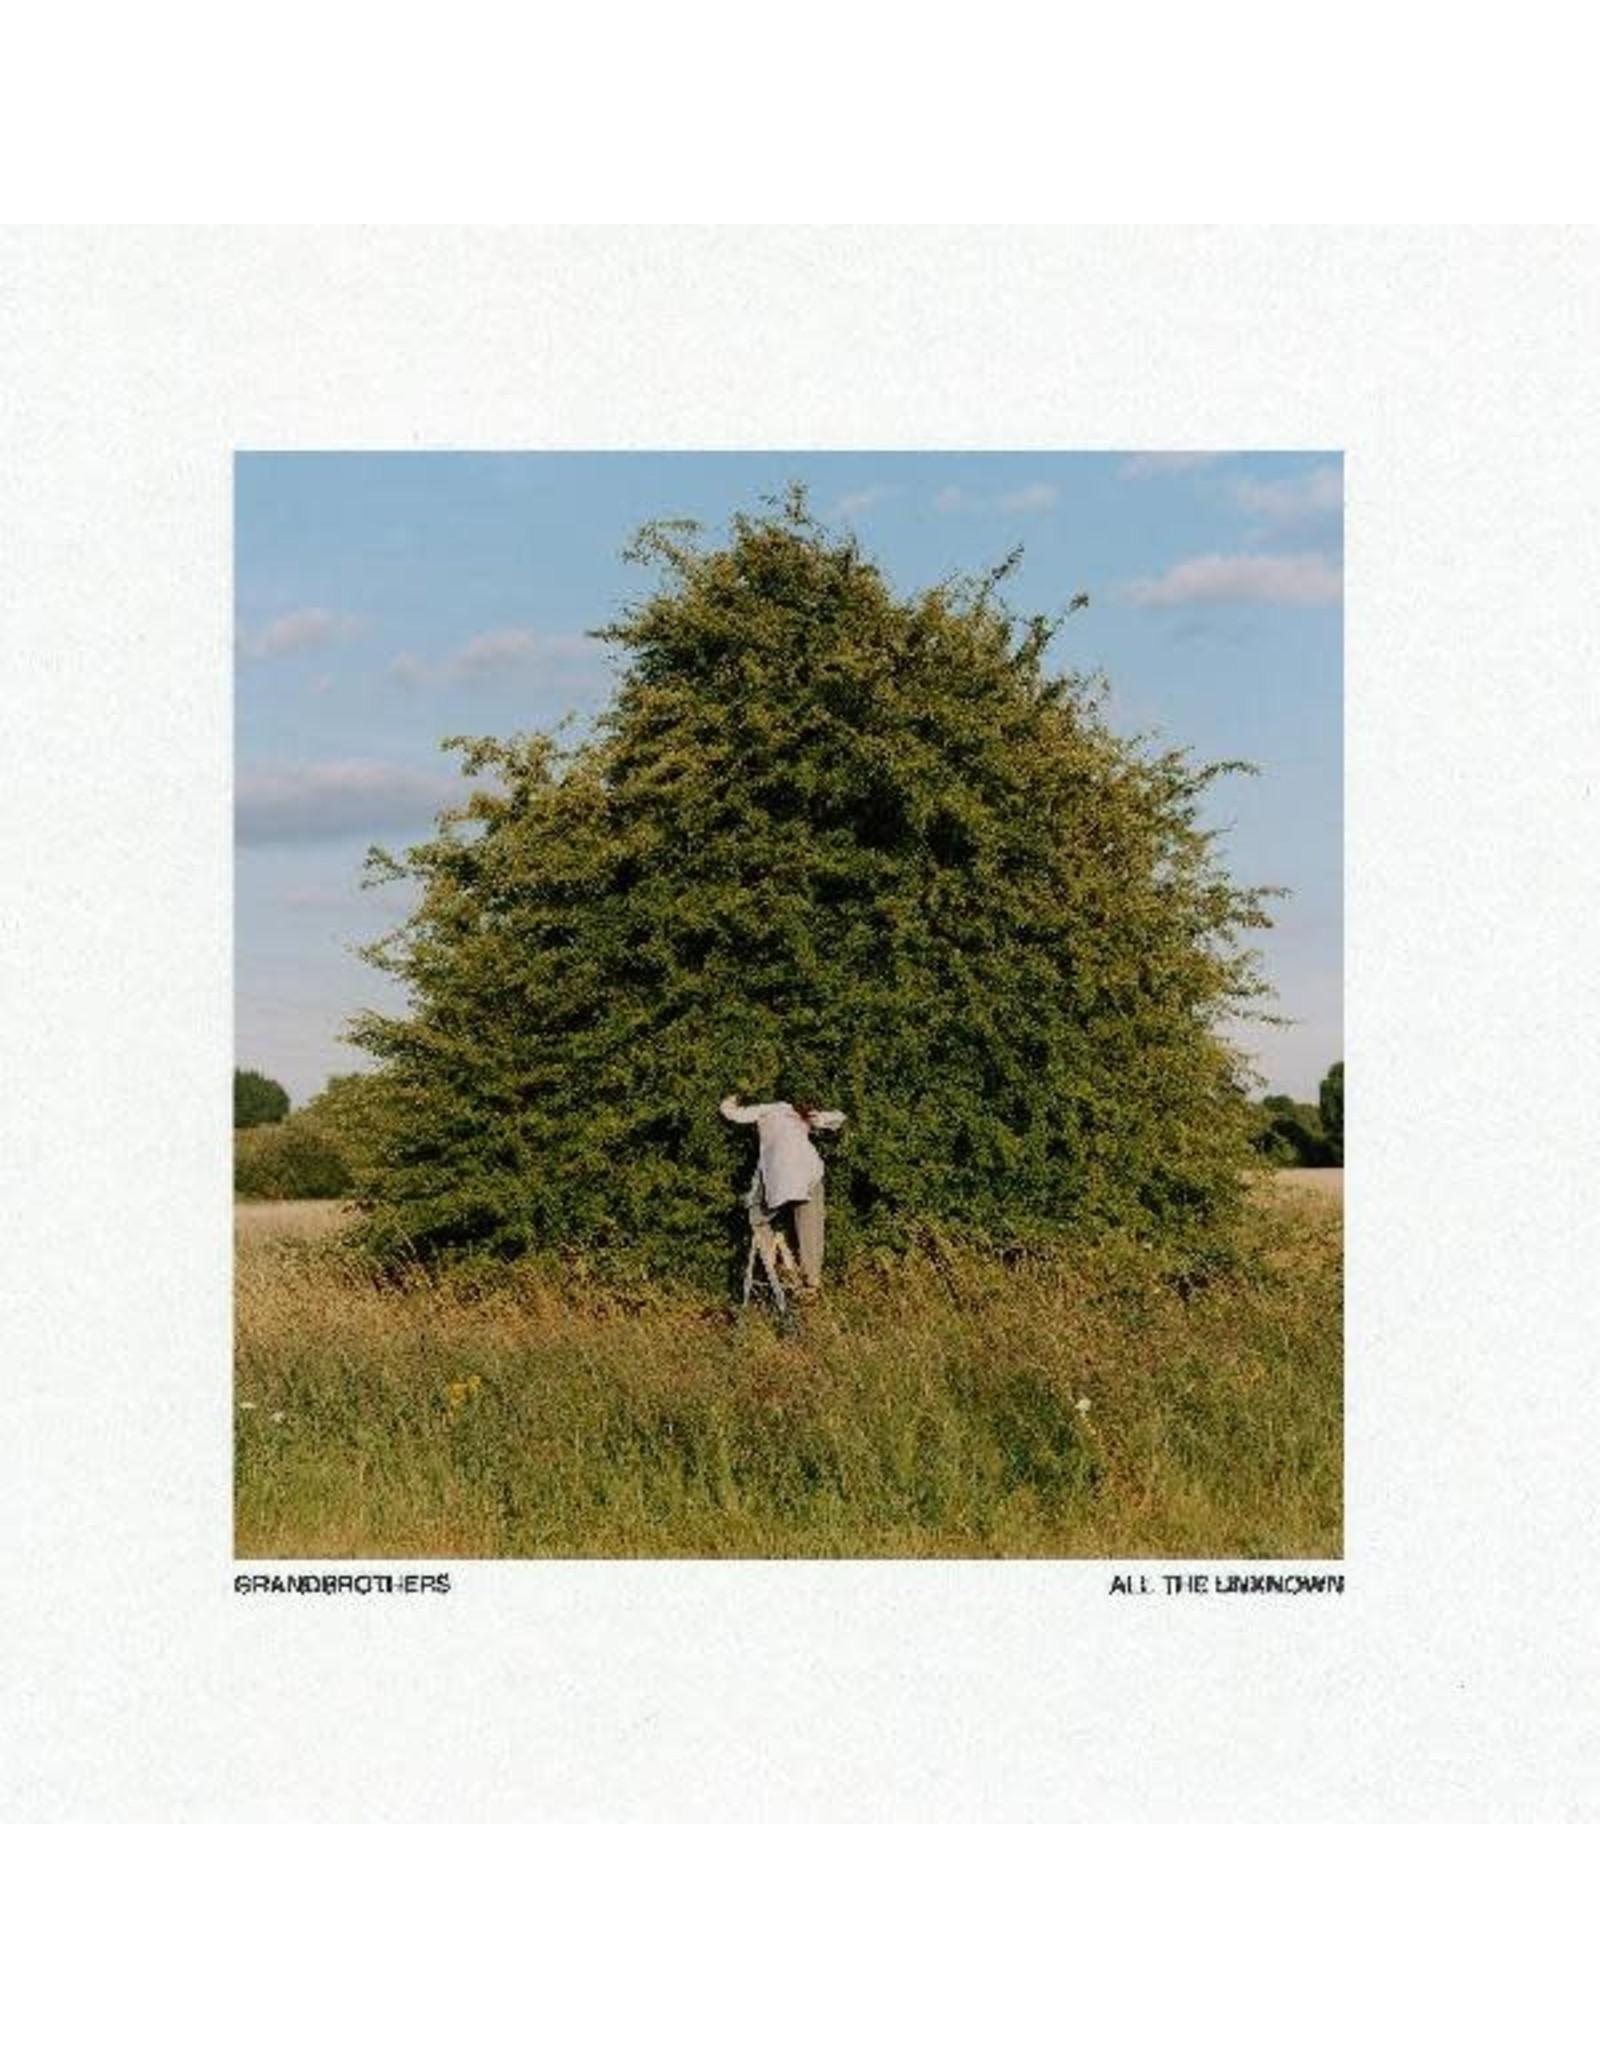 New Vinyl Grandbrothers - All The Unknown 2LP